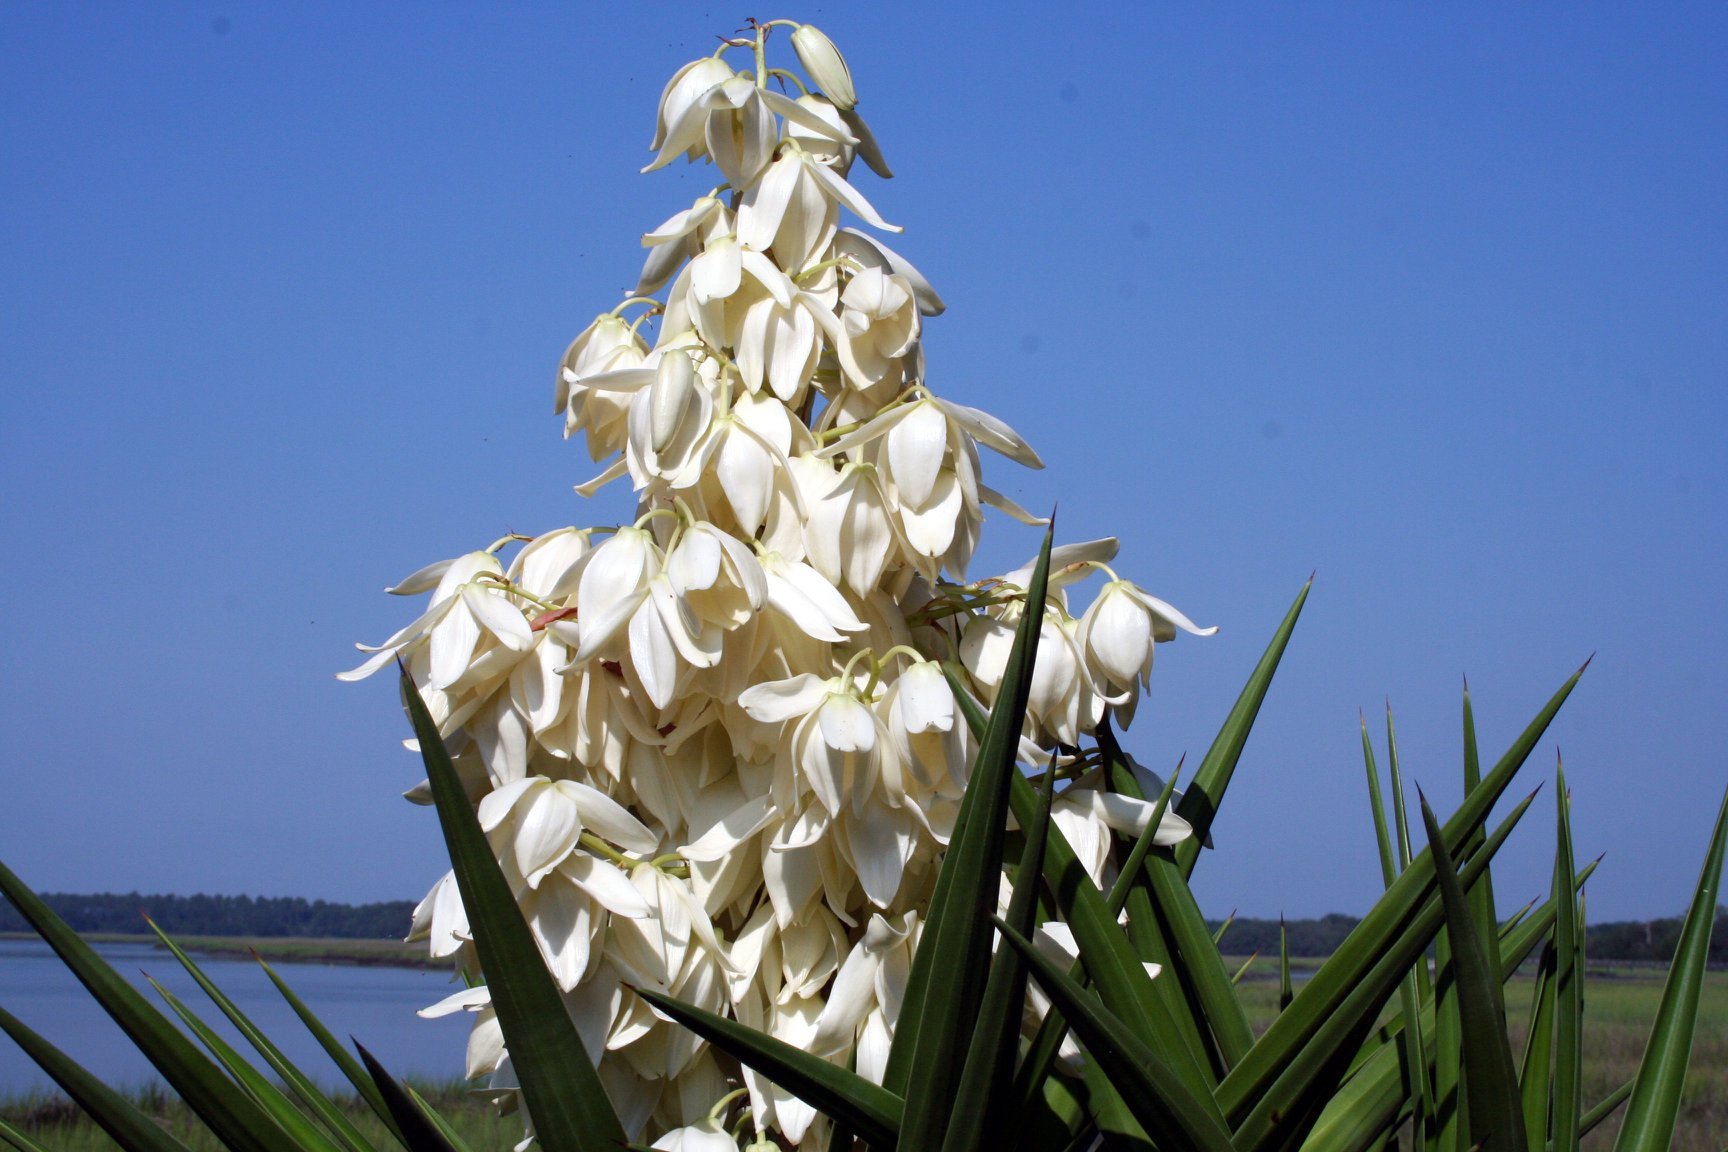 Image Related To Yucca gloriosa (Moundlily Yucca)